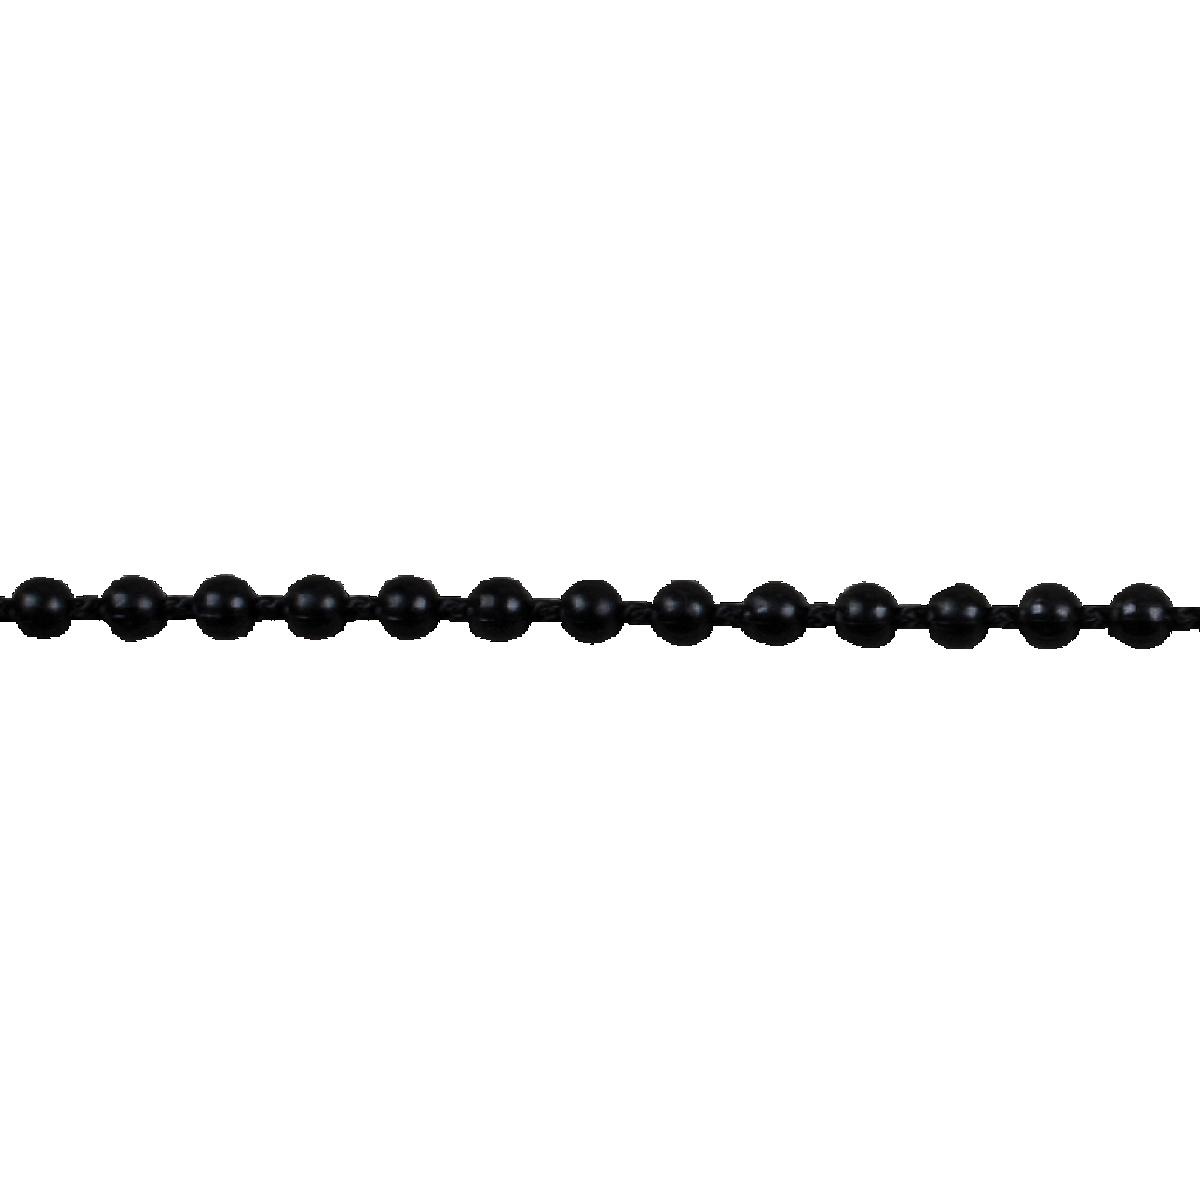 Continuous Plastic Bead Chain, 2' drop Black